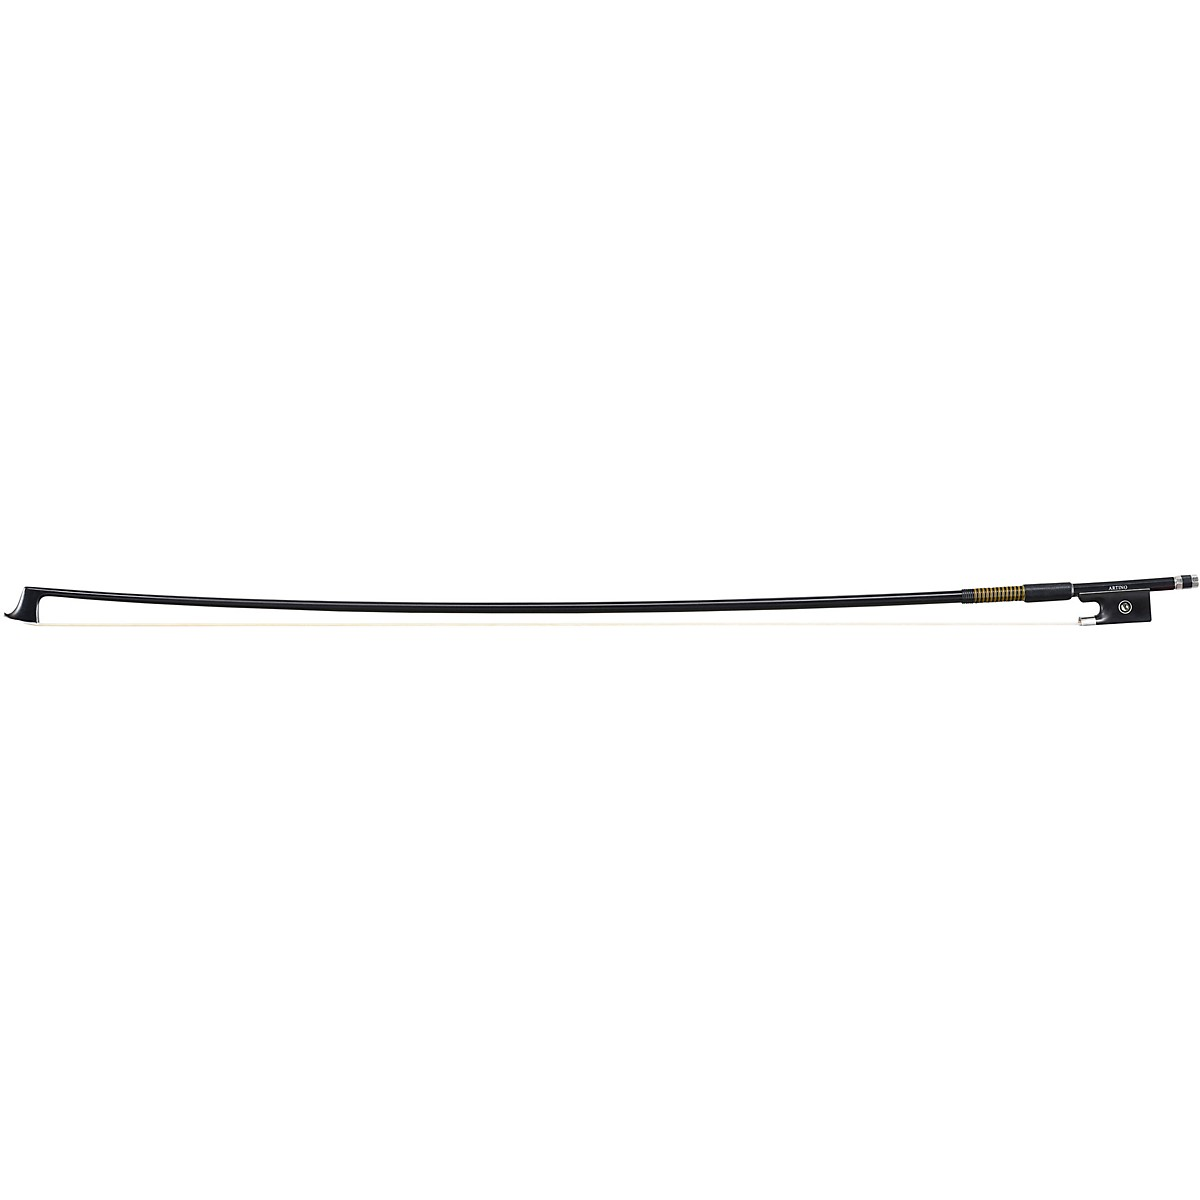 Artino Select Series Carbon Graphite Violin Bow